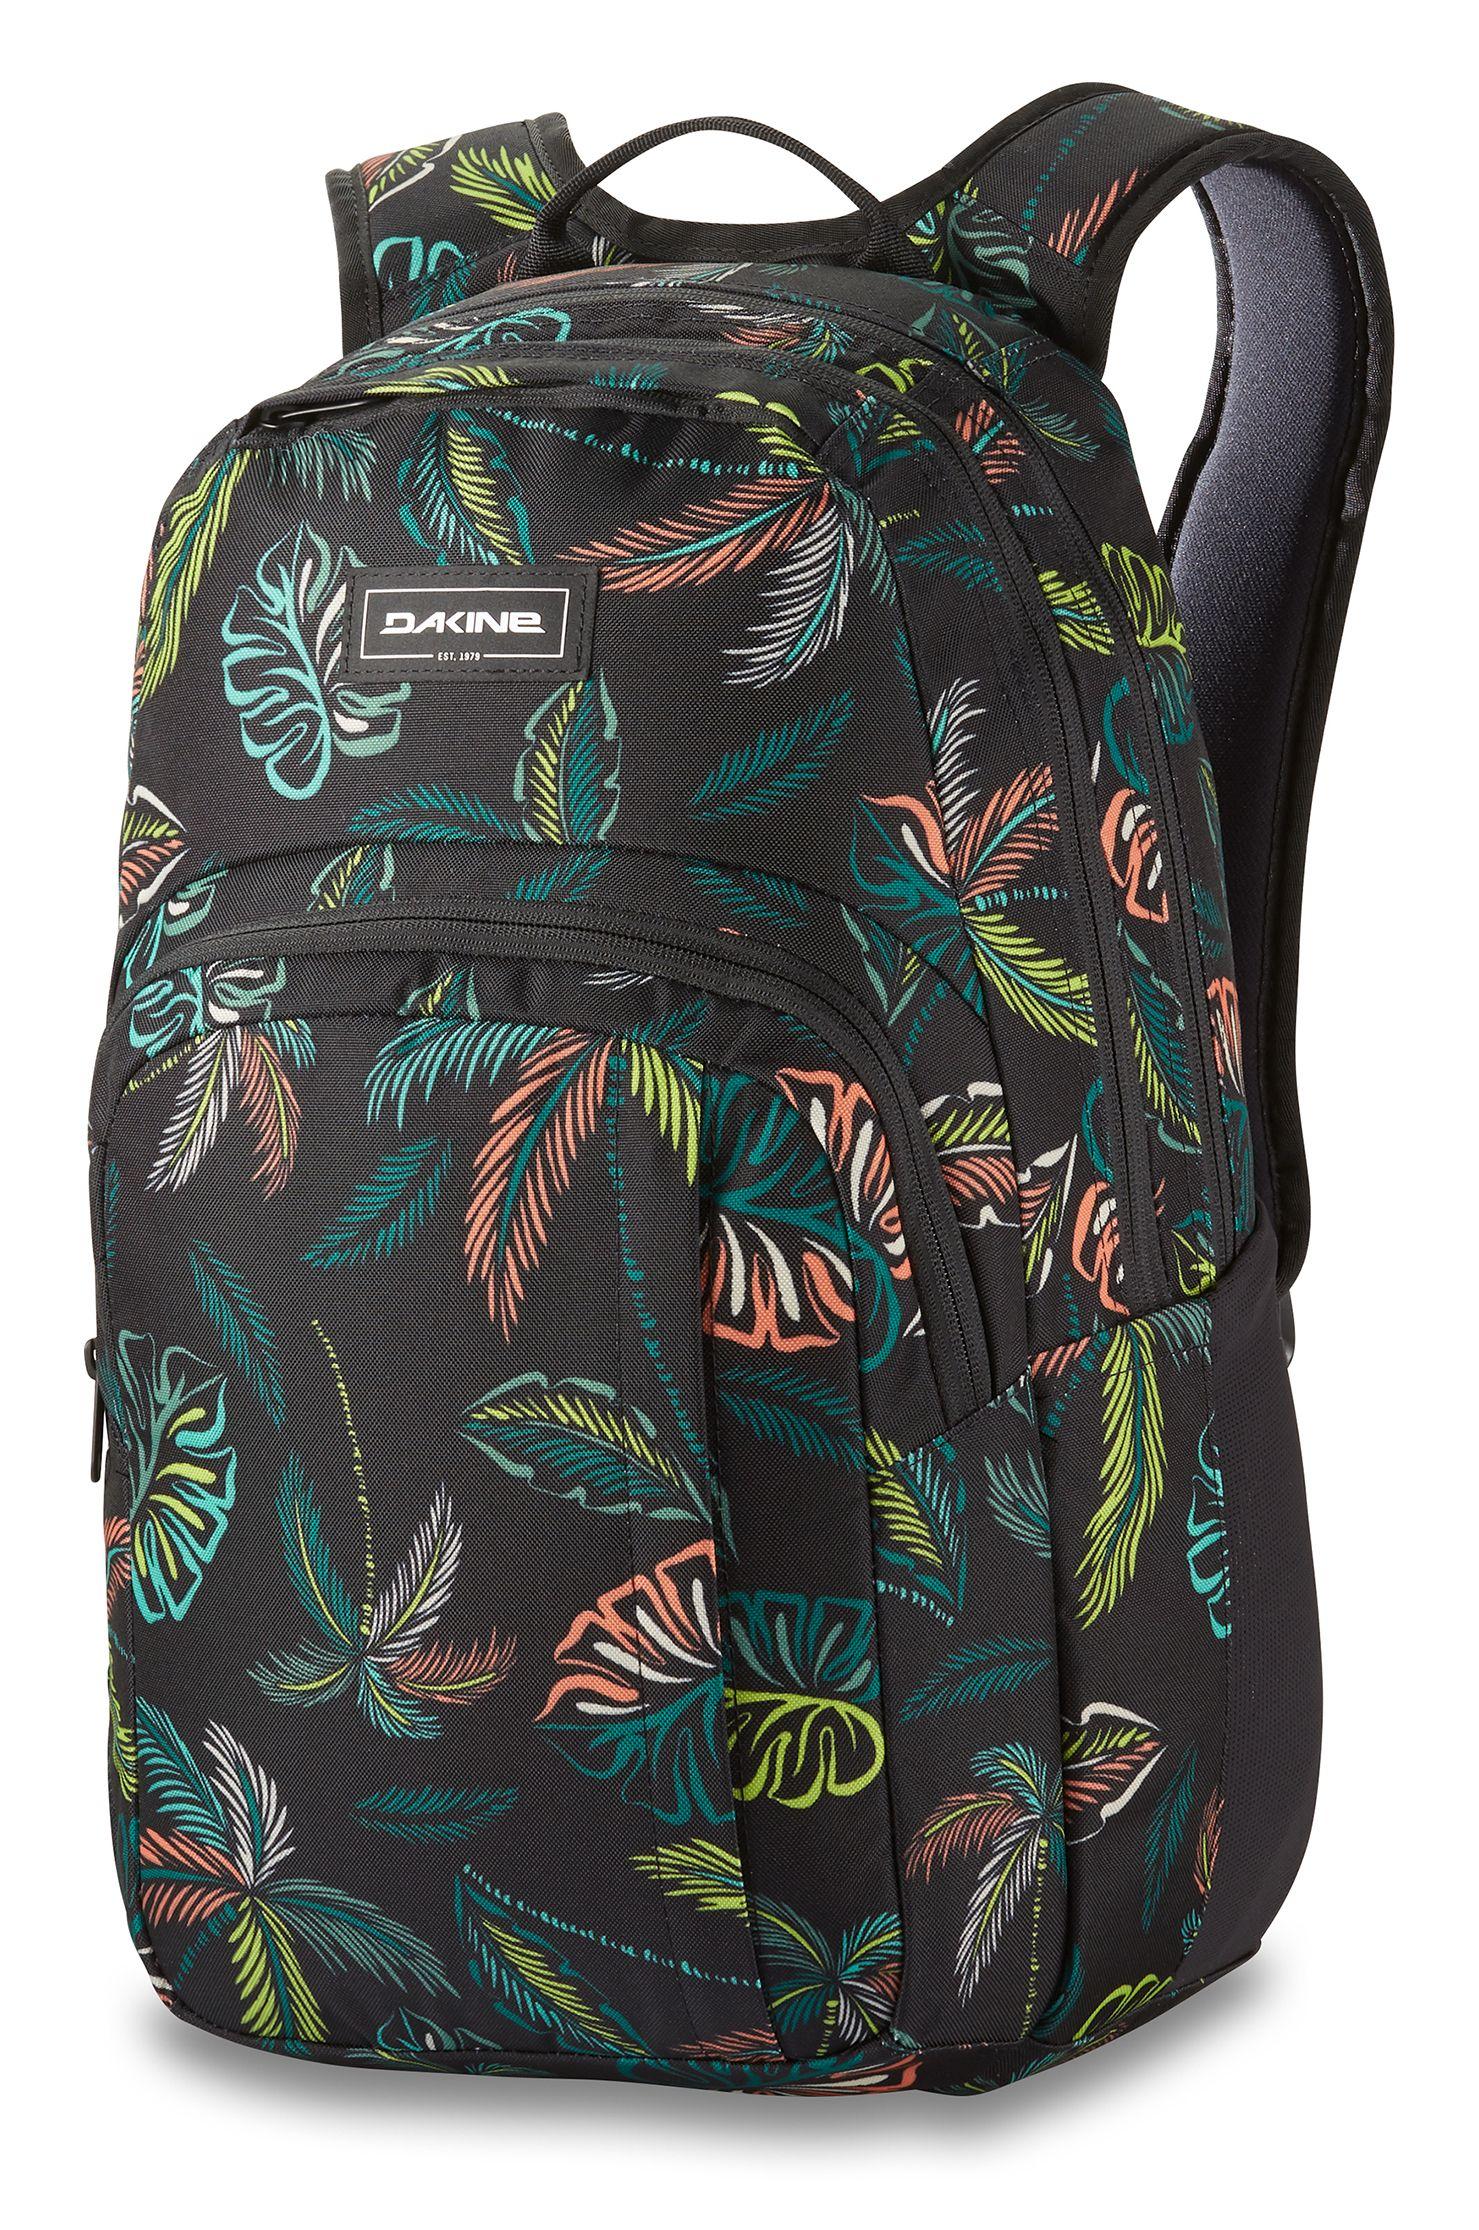 Dakine Backpack CAMPUS M 25L Electric Tropical